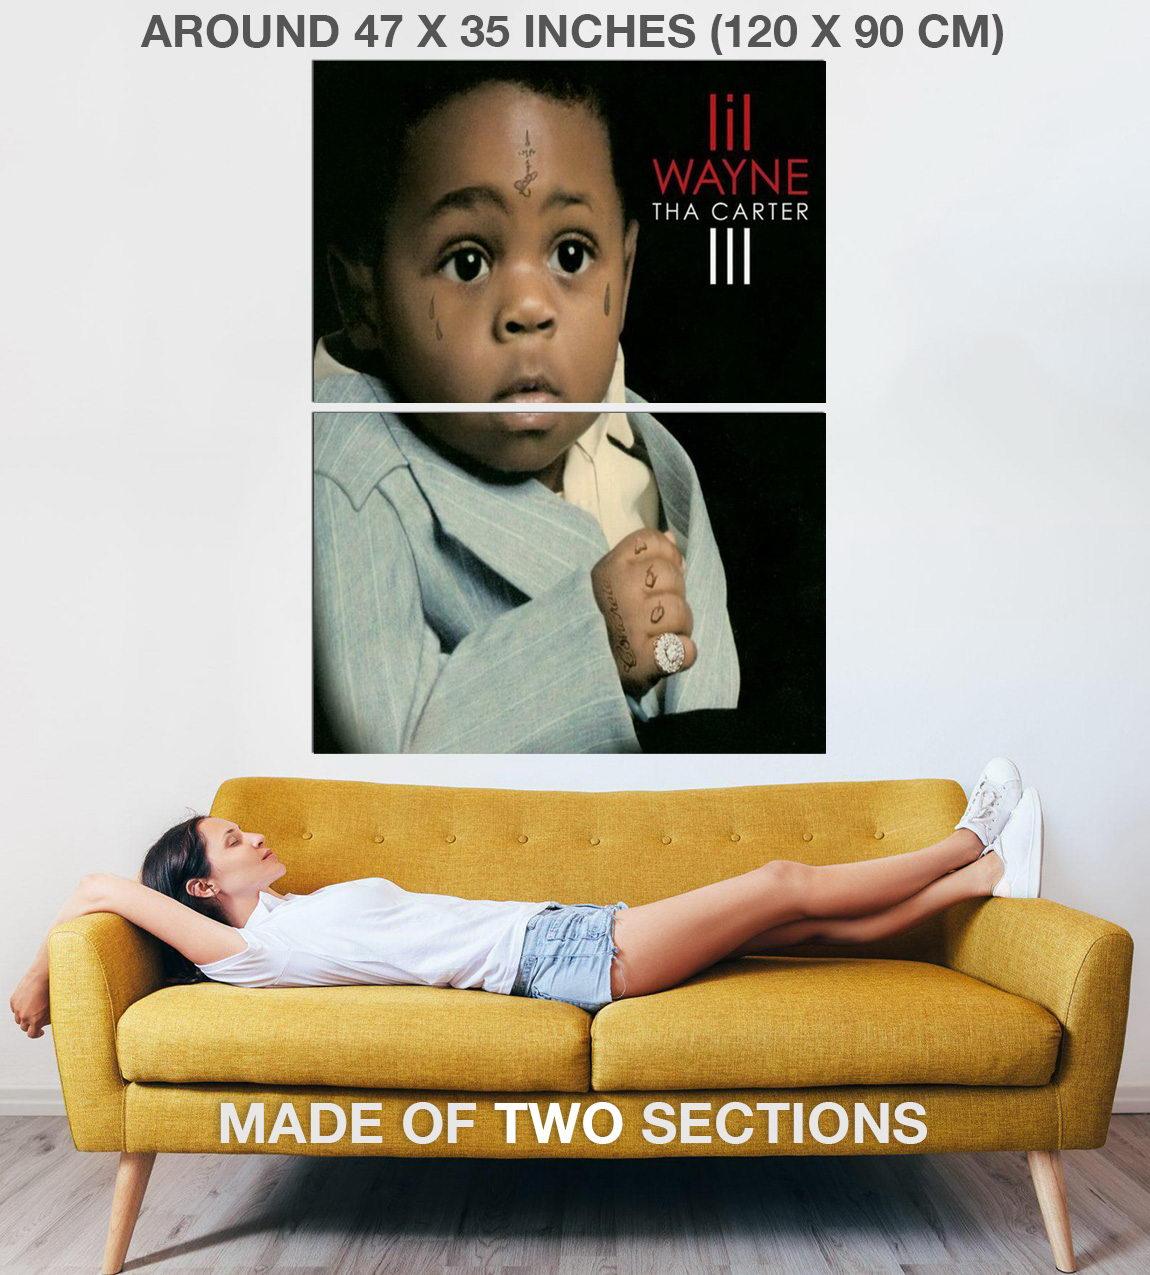 Indexbild 5 - 328178 Lil Wayne Tha Carter III Album 2008 Cover PRINT POSTER DE